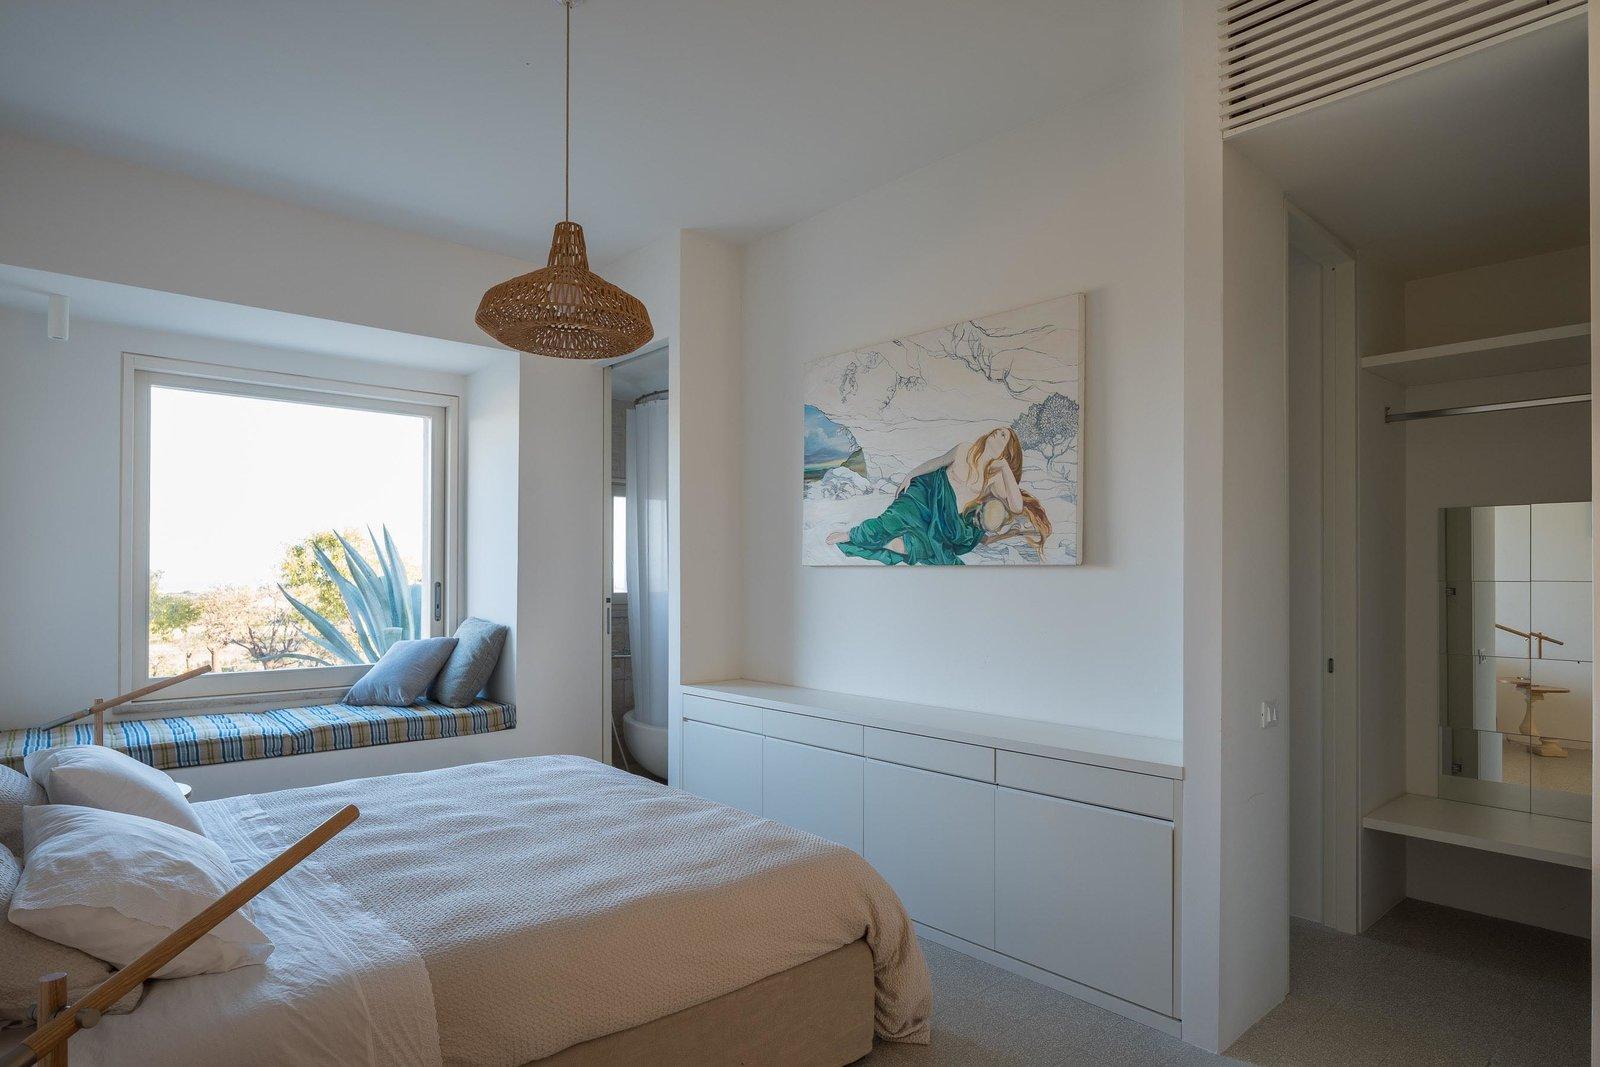 Bedroom, Pendant Lighting, Bed, Bench, and Wardrobe Master bedroom  Cozzo Coniglio